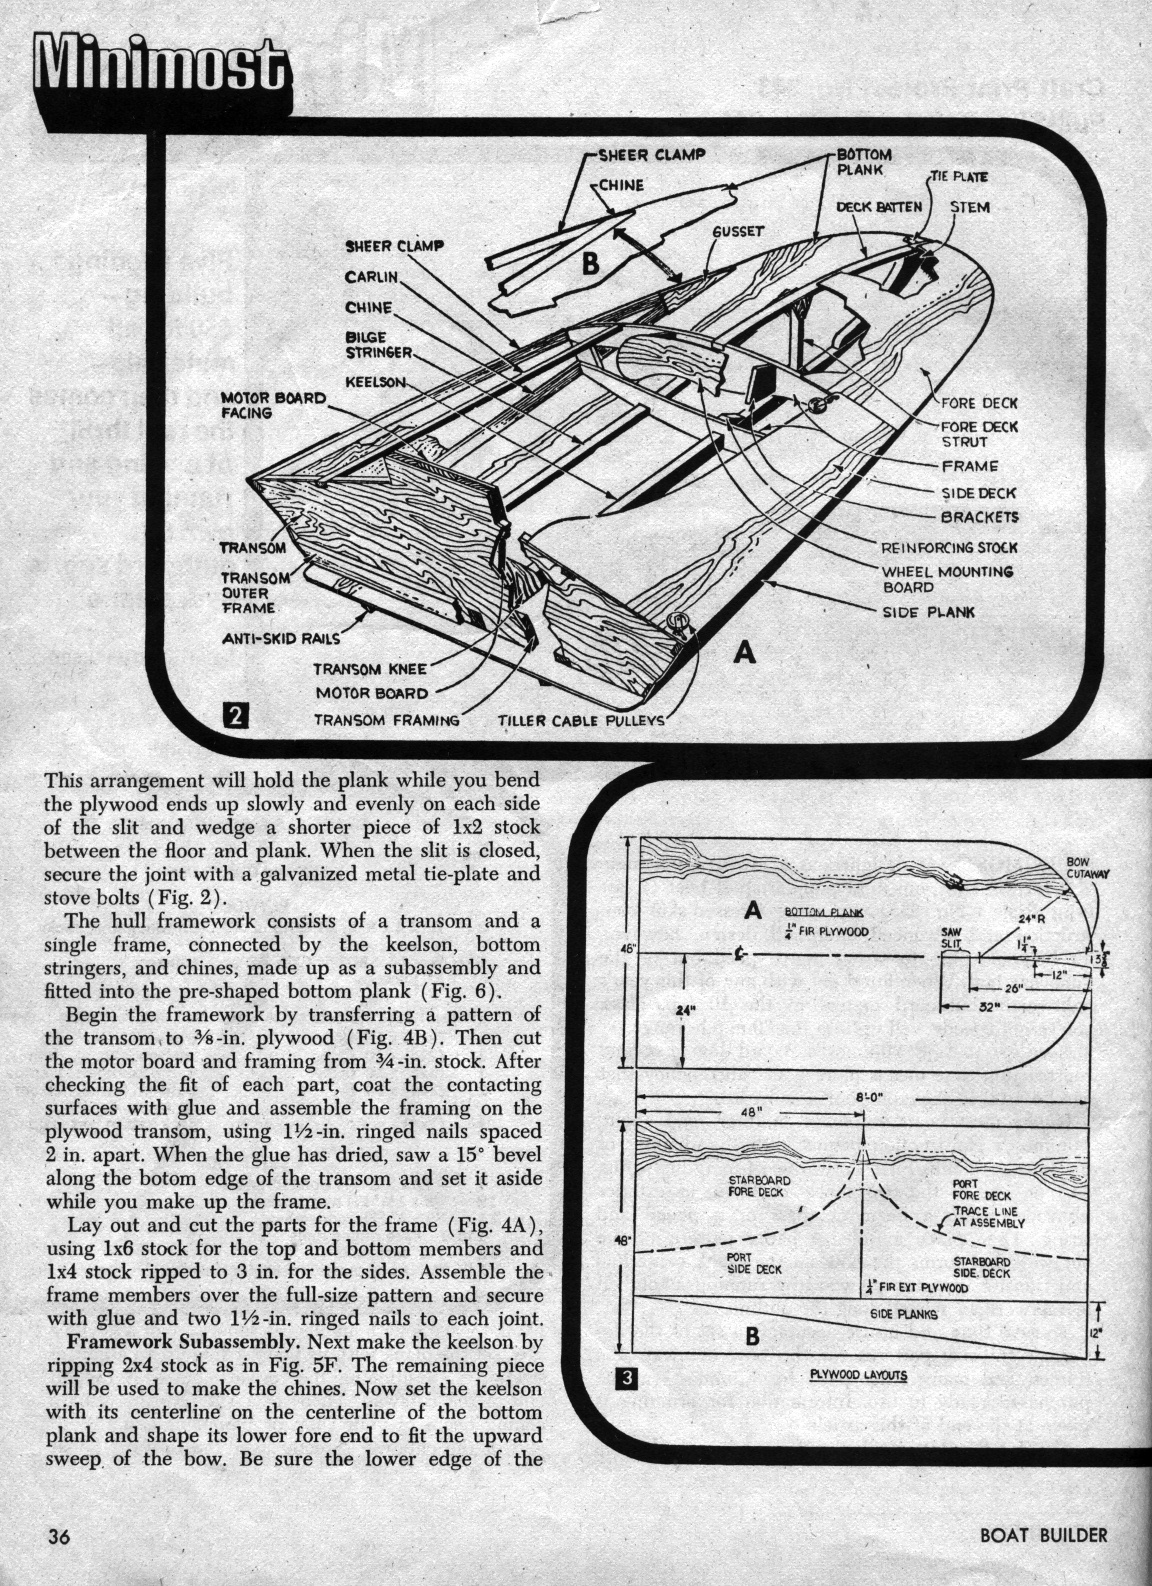 Real Free model hydroplane plans | Buildsme